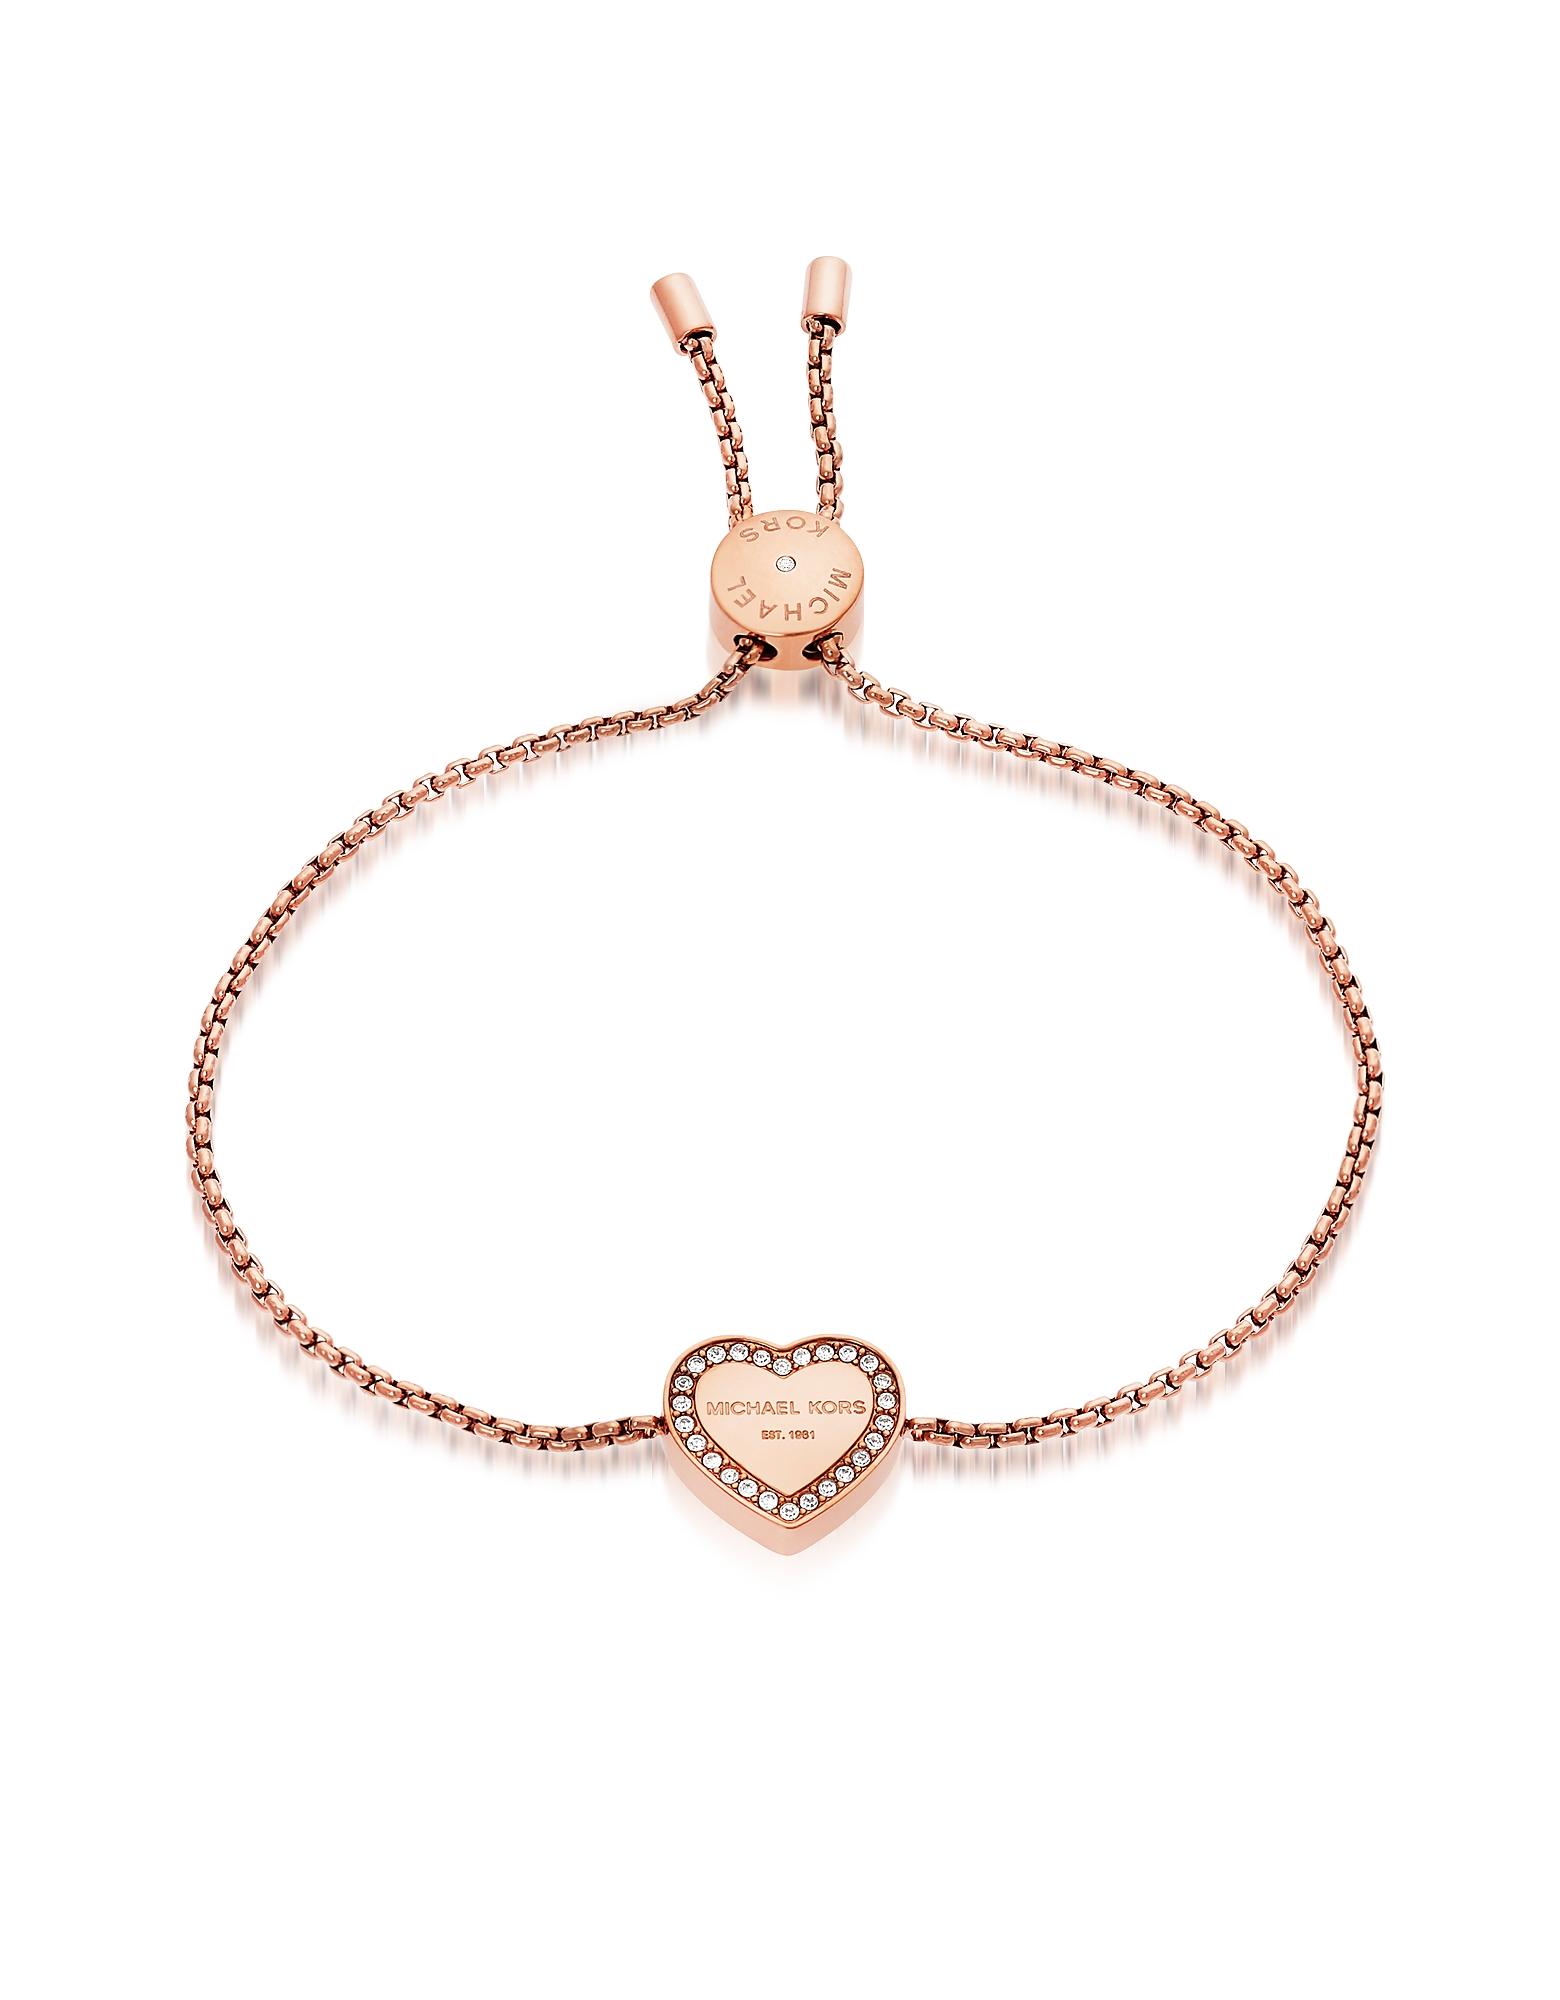 Michael Kors Bracelets, Heritage PVD Rose Goldtone Stainless Heart Bracelet w/Crystals